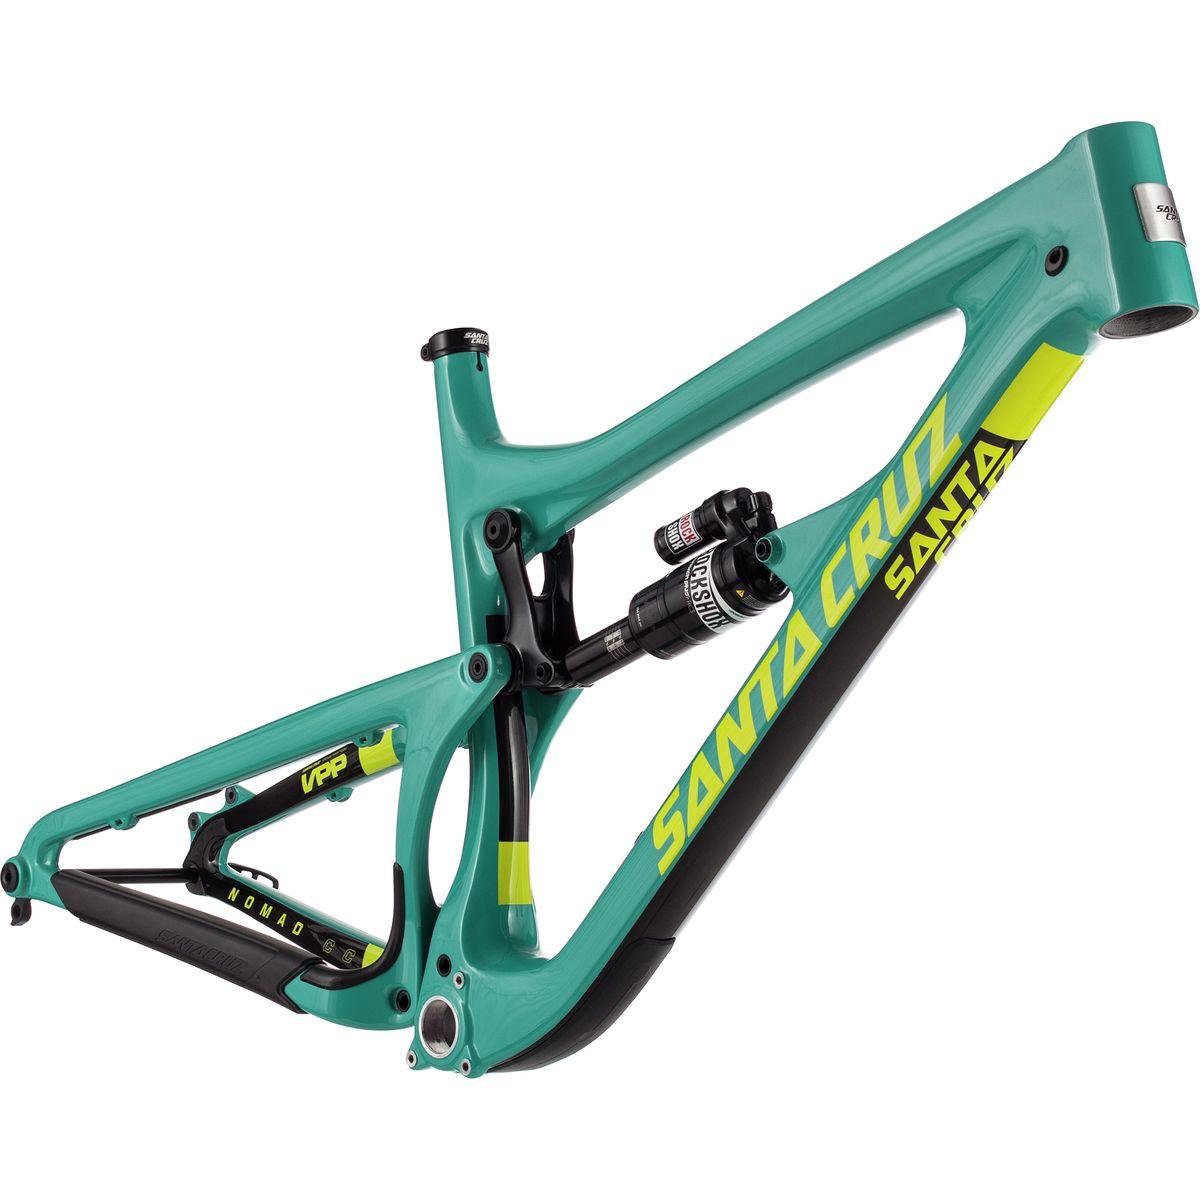 Santa Cruz Nomad Carbon CC Monarch Mountain Bike Frame